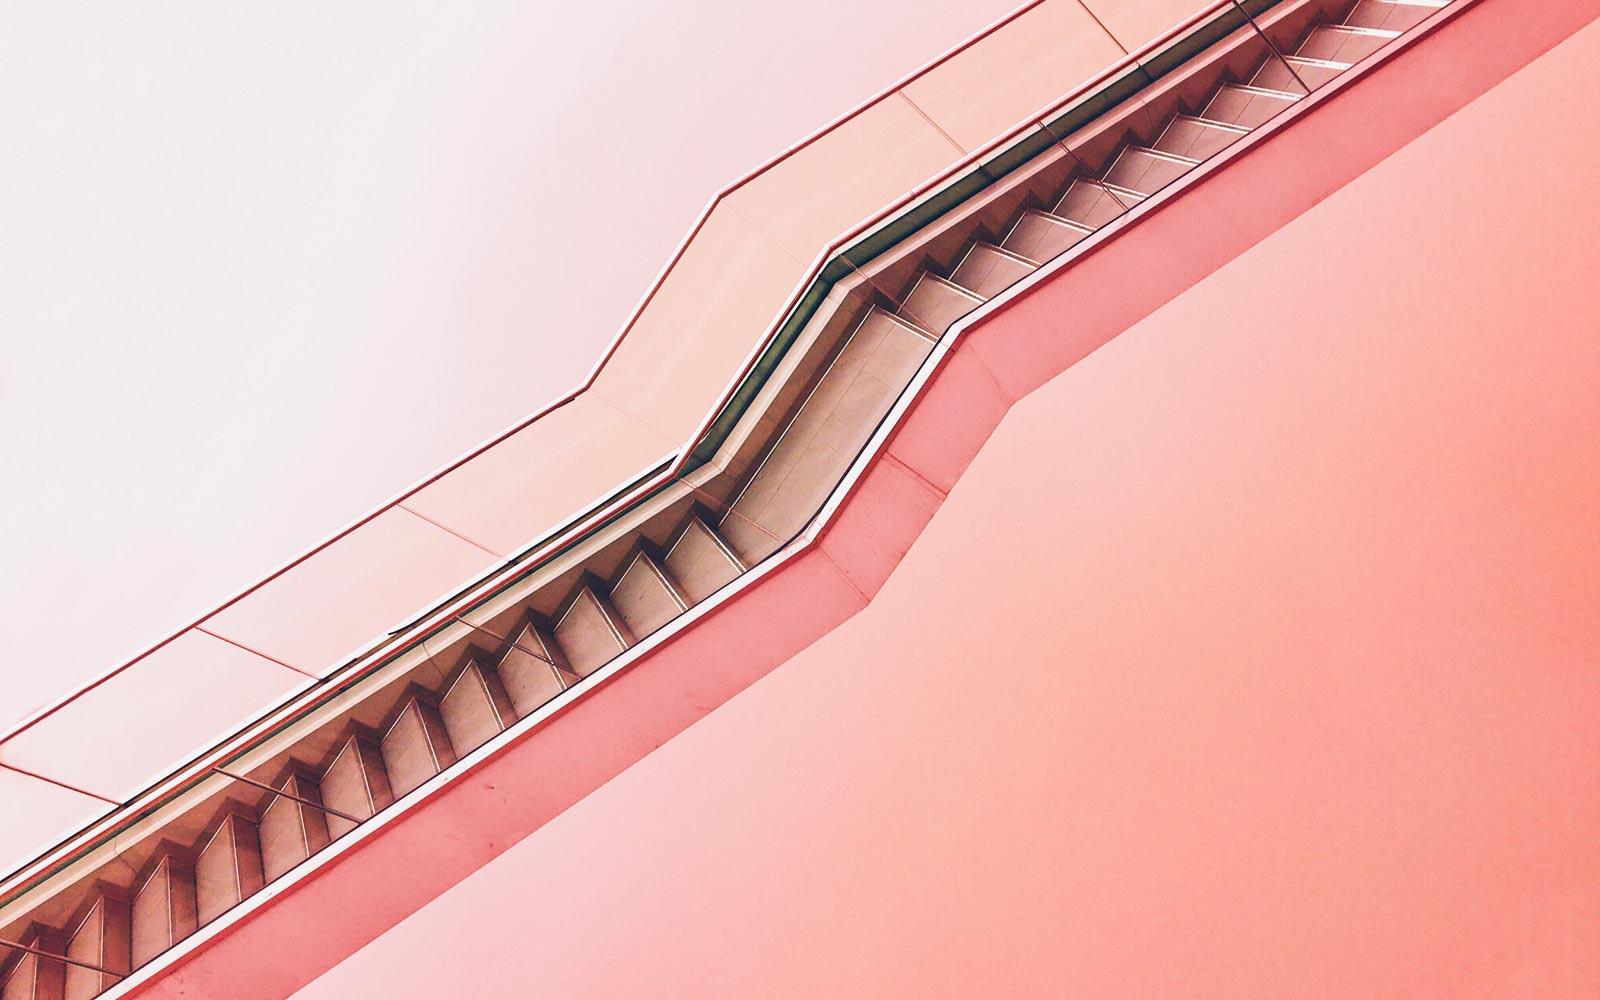 Stylish photo of an escalator